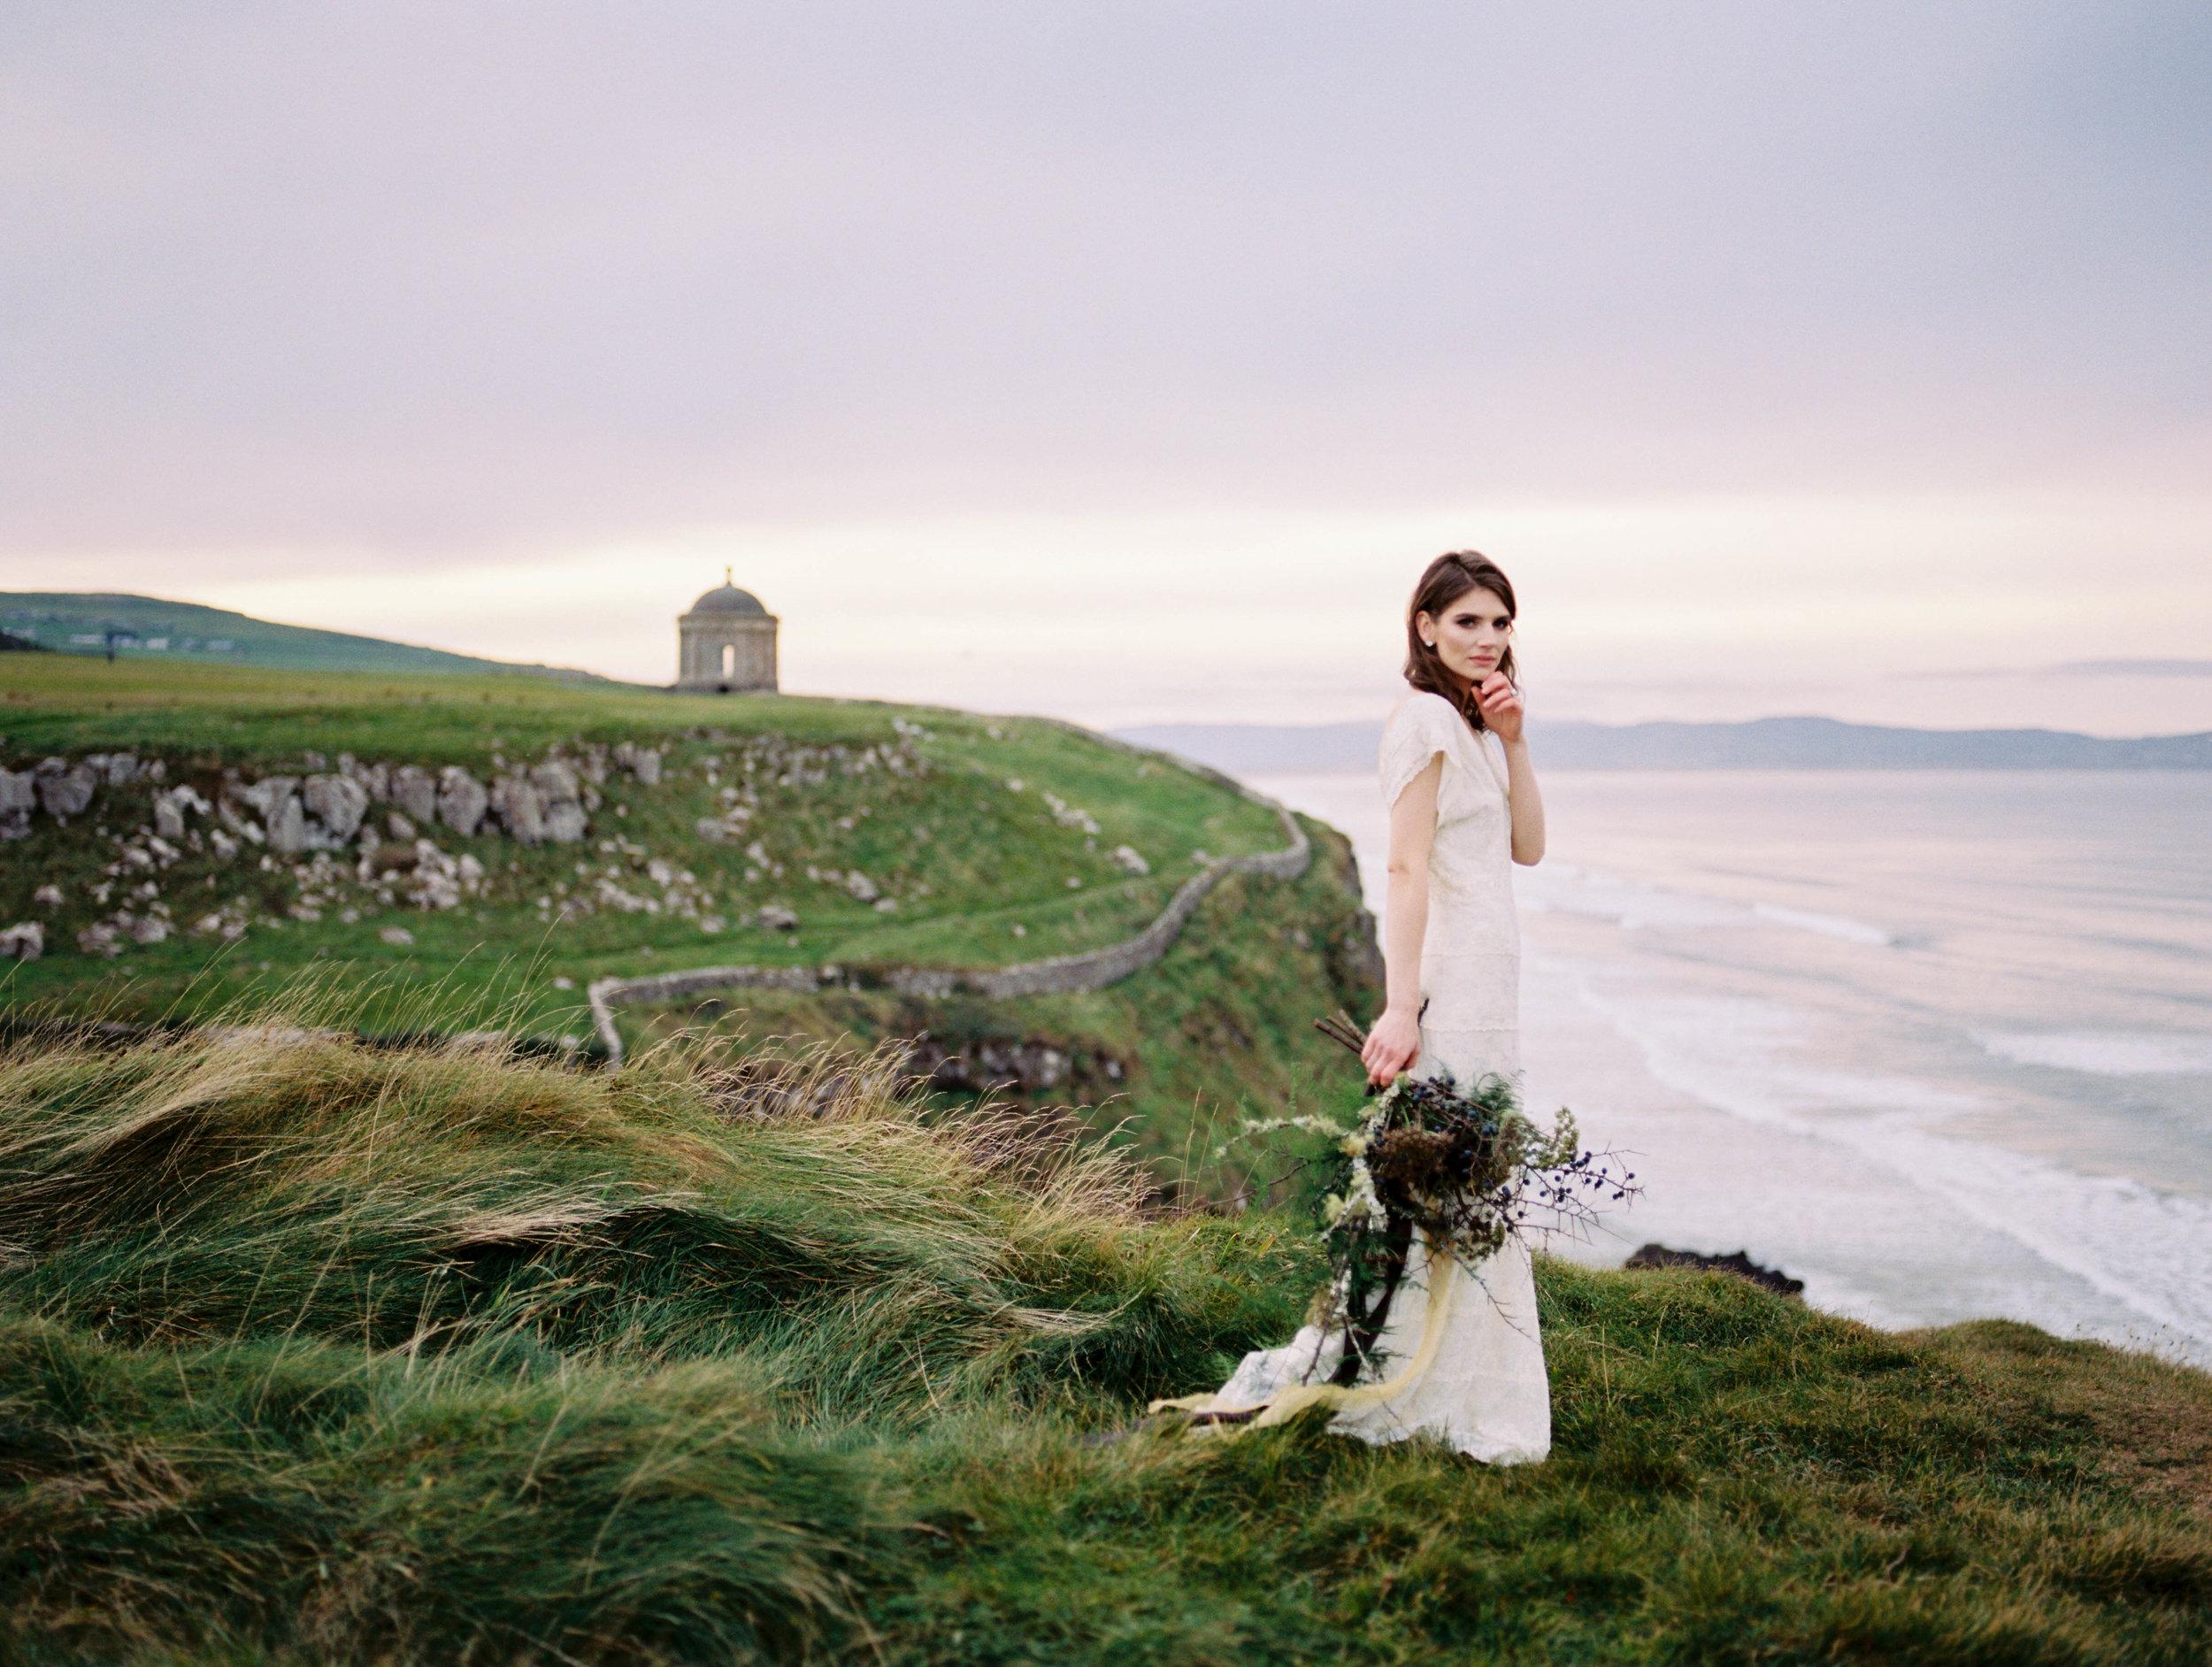 Eli Defaria Photography Northen Ireland Wedding Editorial Inspiration 2018 298.jpg